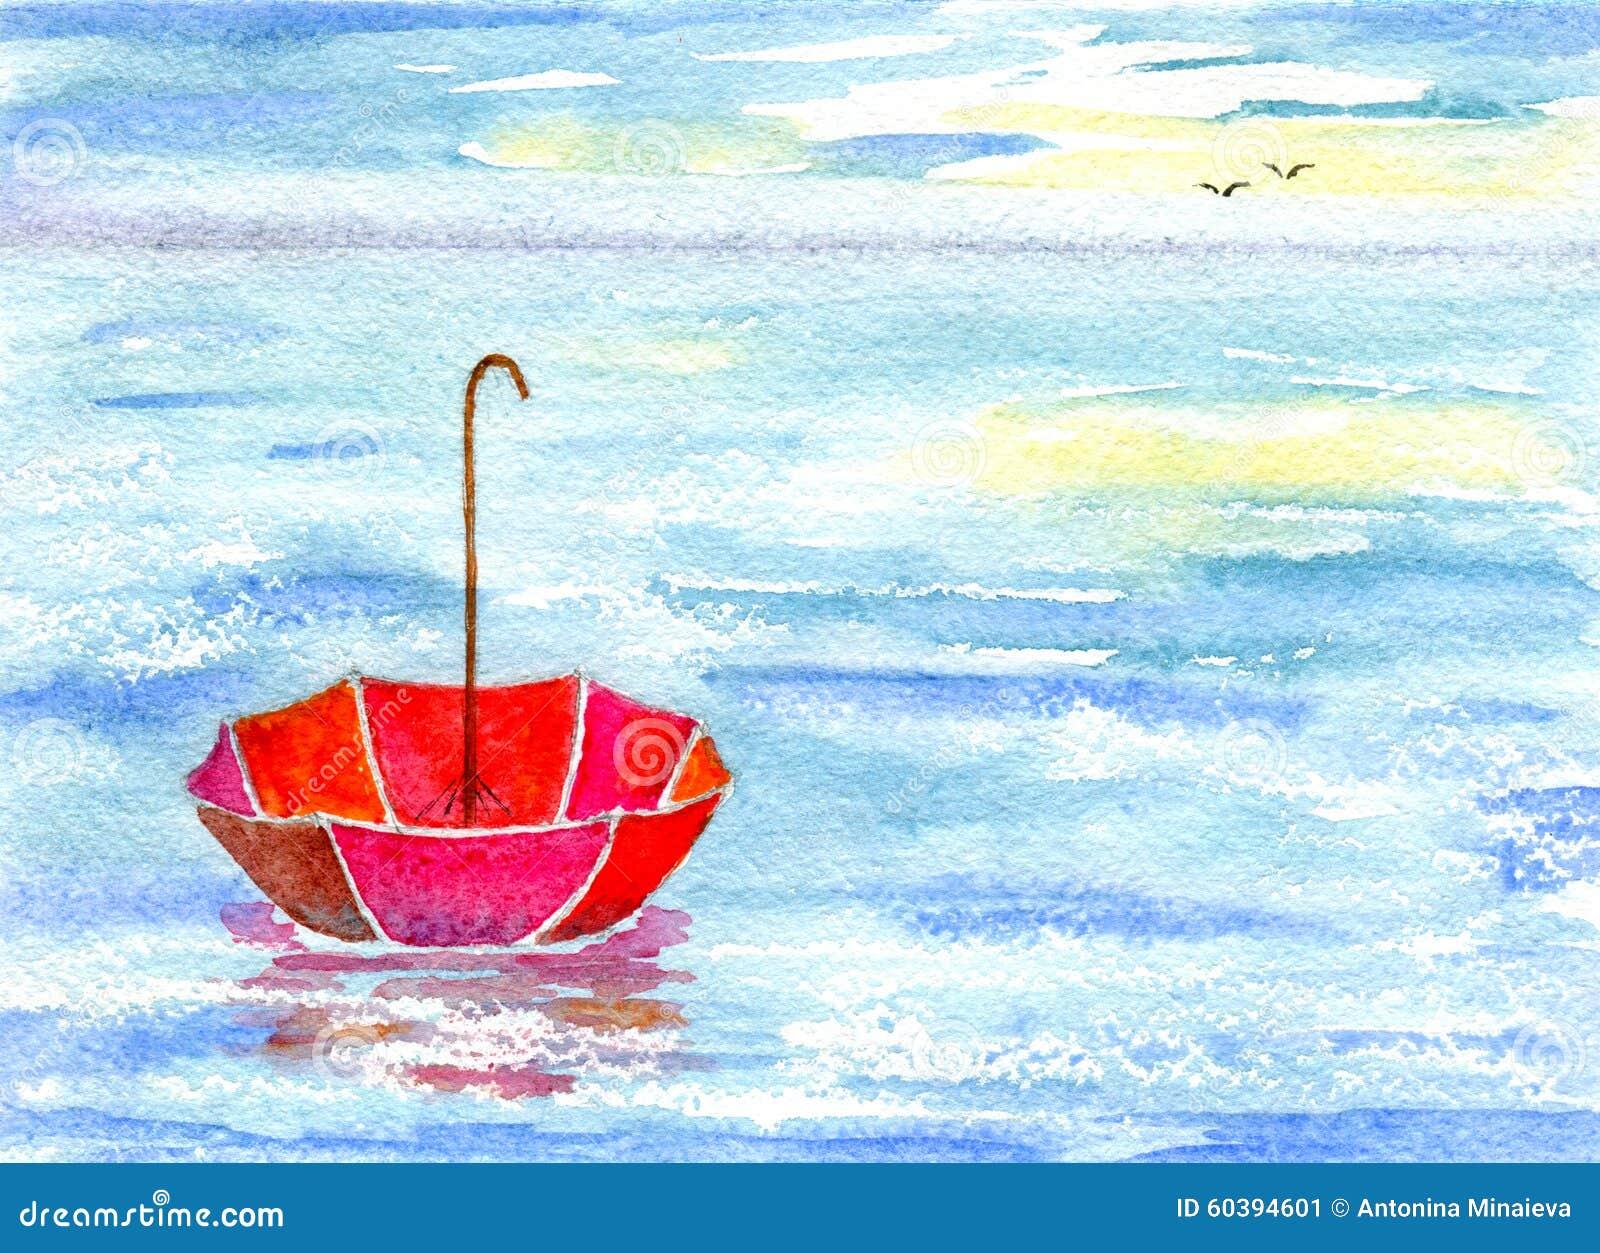 Sea and umbrella